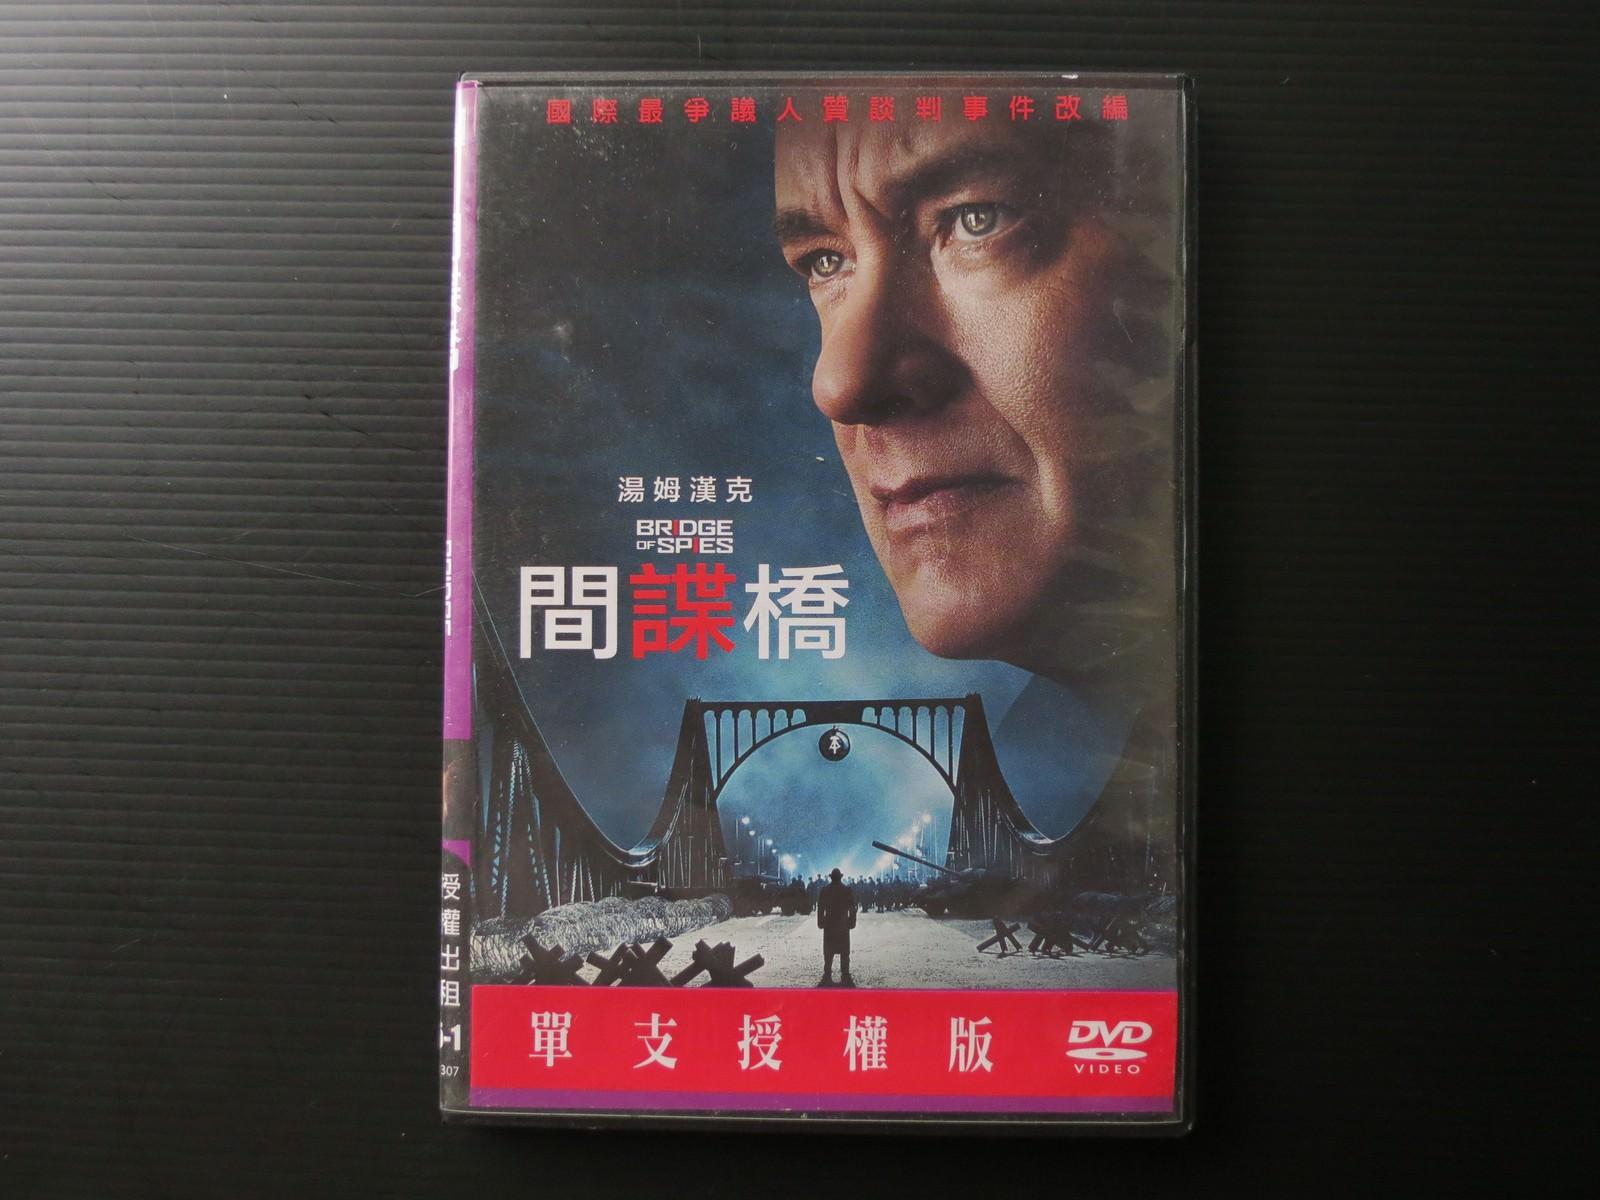 Movie, Bridge of Spies(美國, 2015年) / 間諜橋(台灣) / 间谍之桥(中國) / 換諜者(香港), 電影DVD